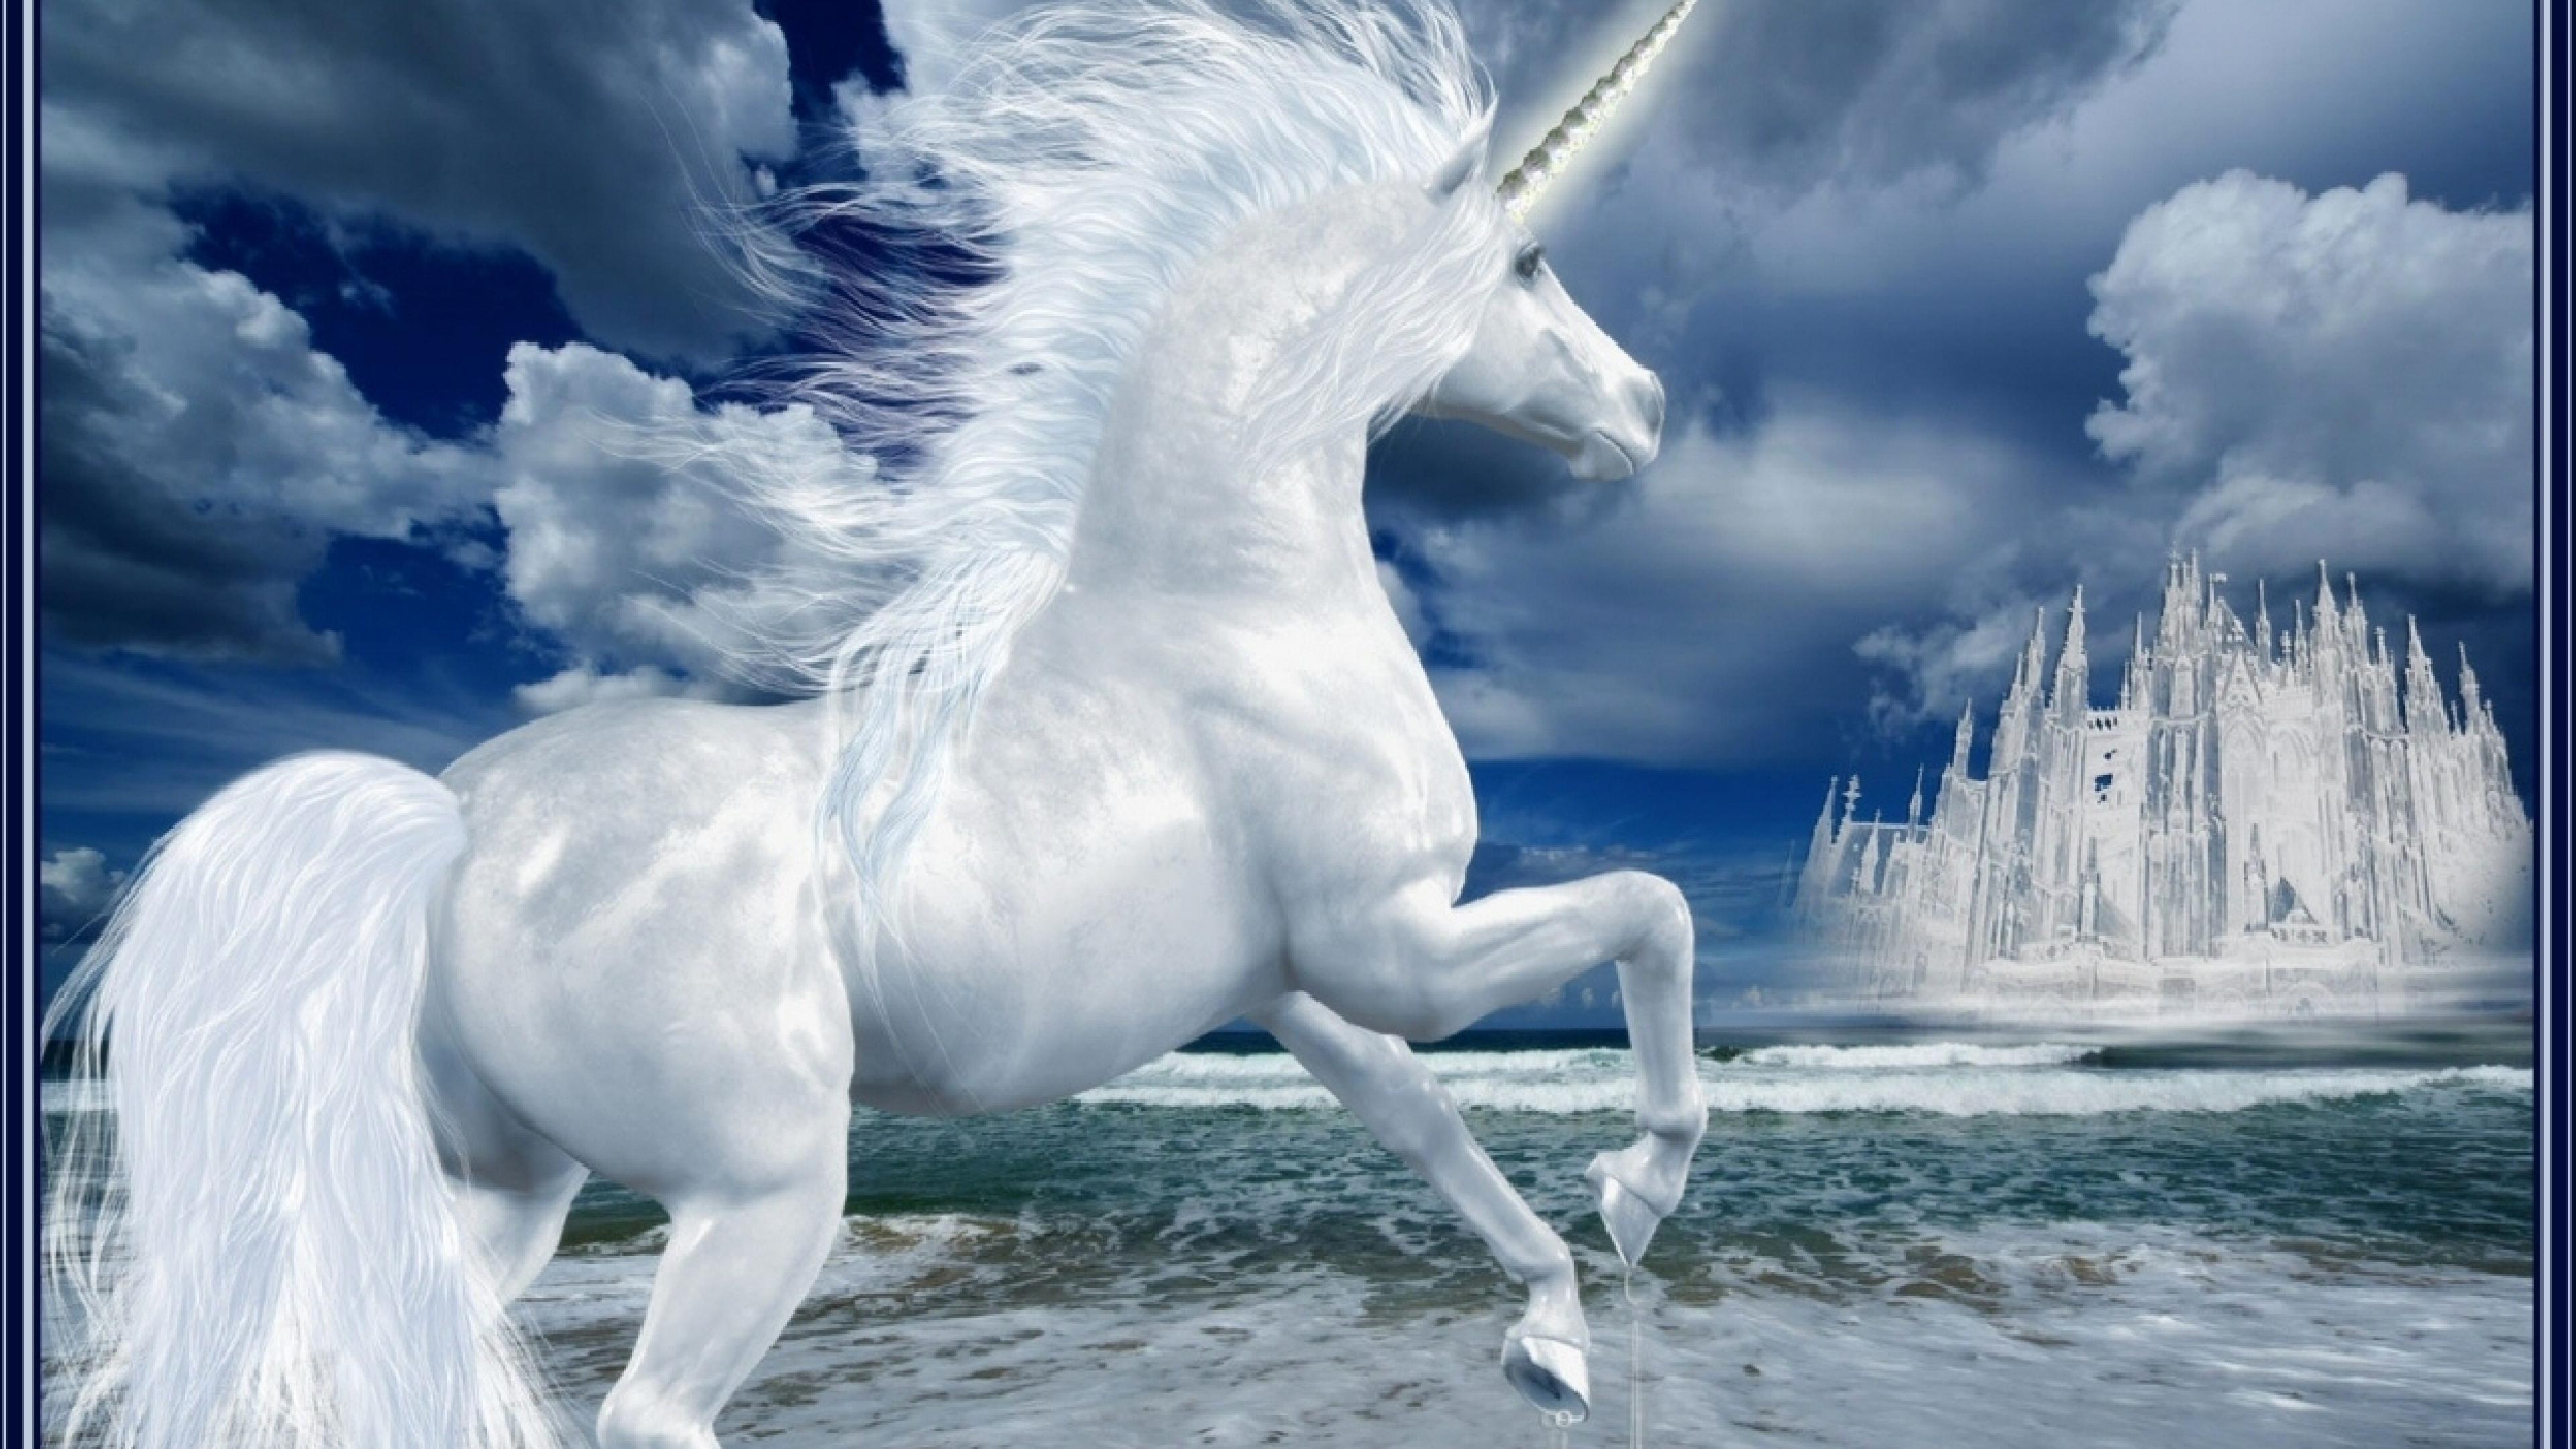 Download Wallpaper 3840x2160 unicorn lock phantom ice 4K Ultra HD 3840x2160